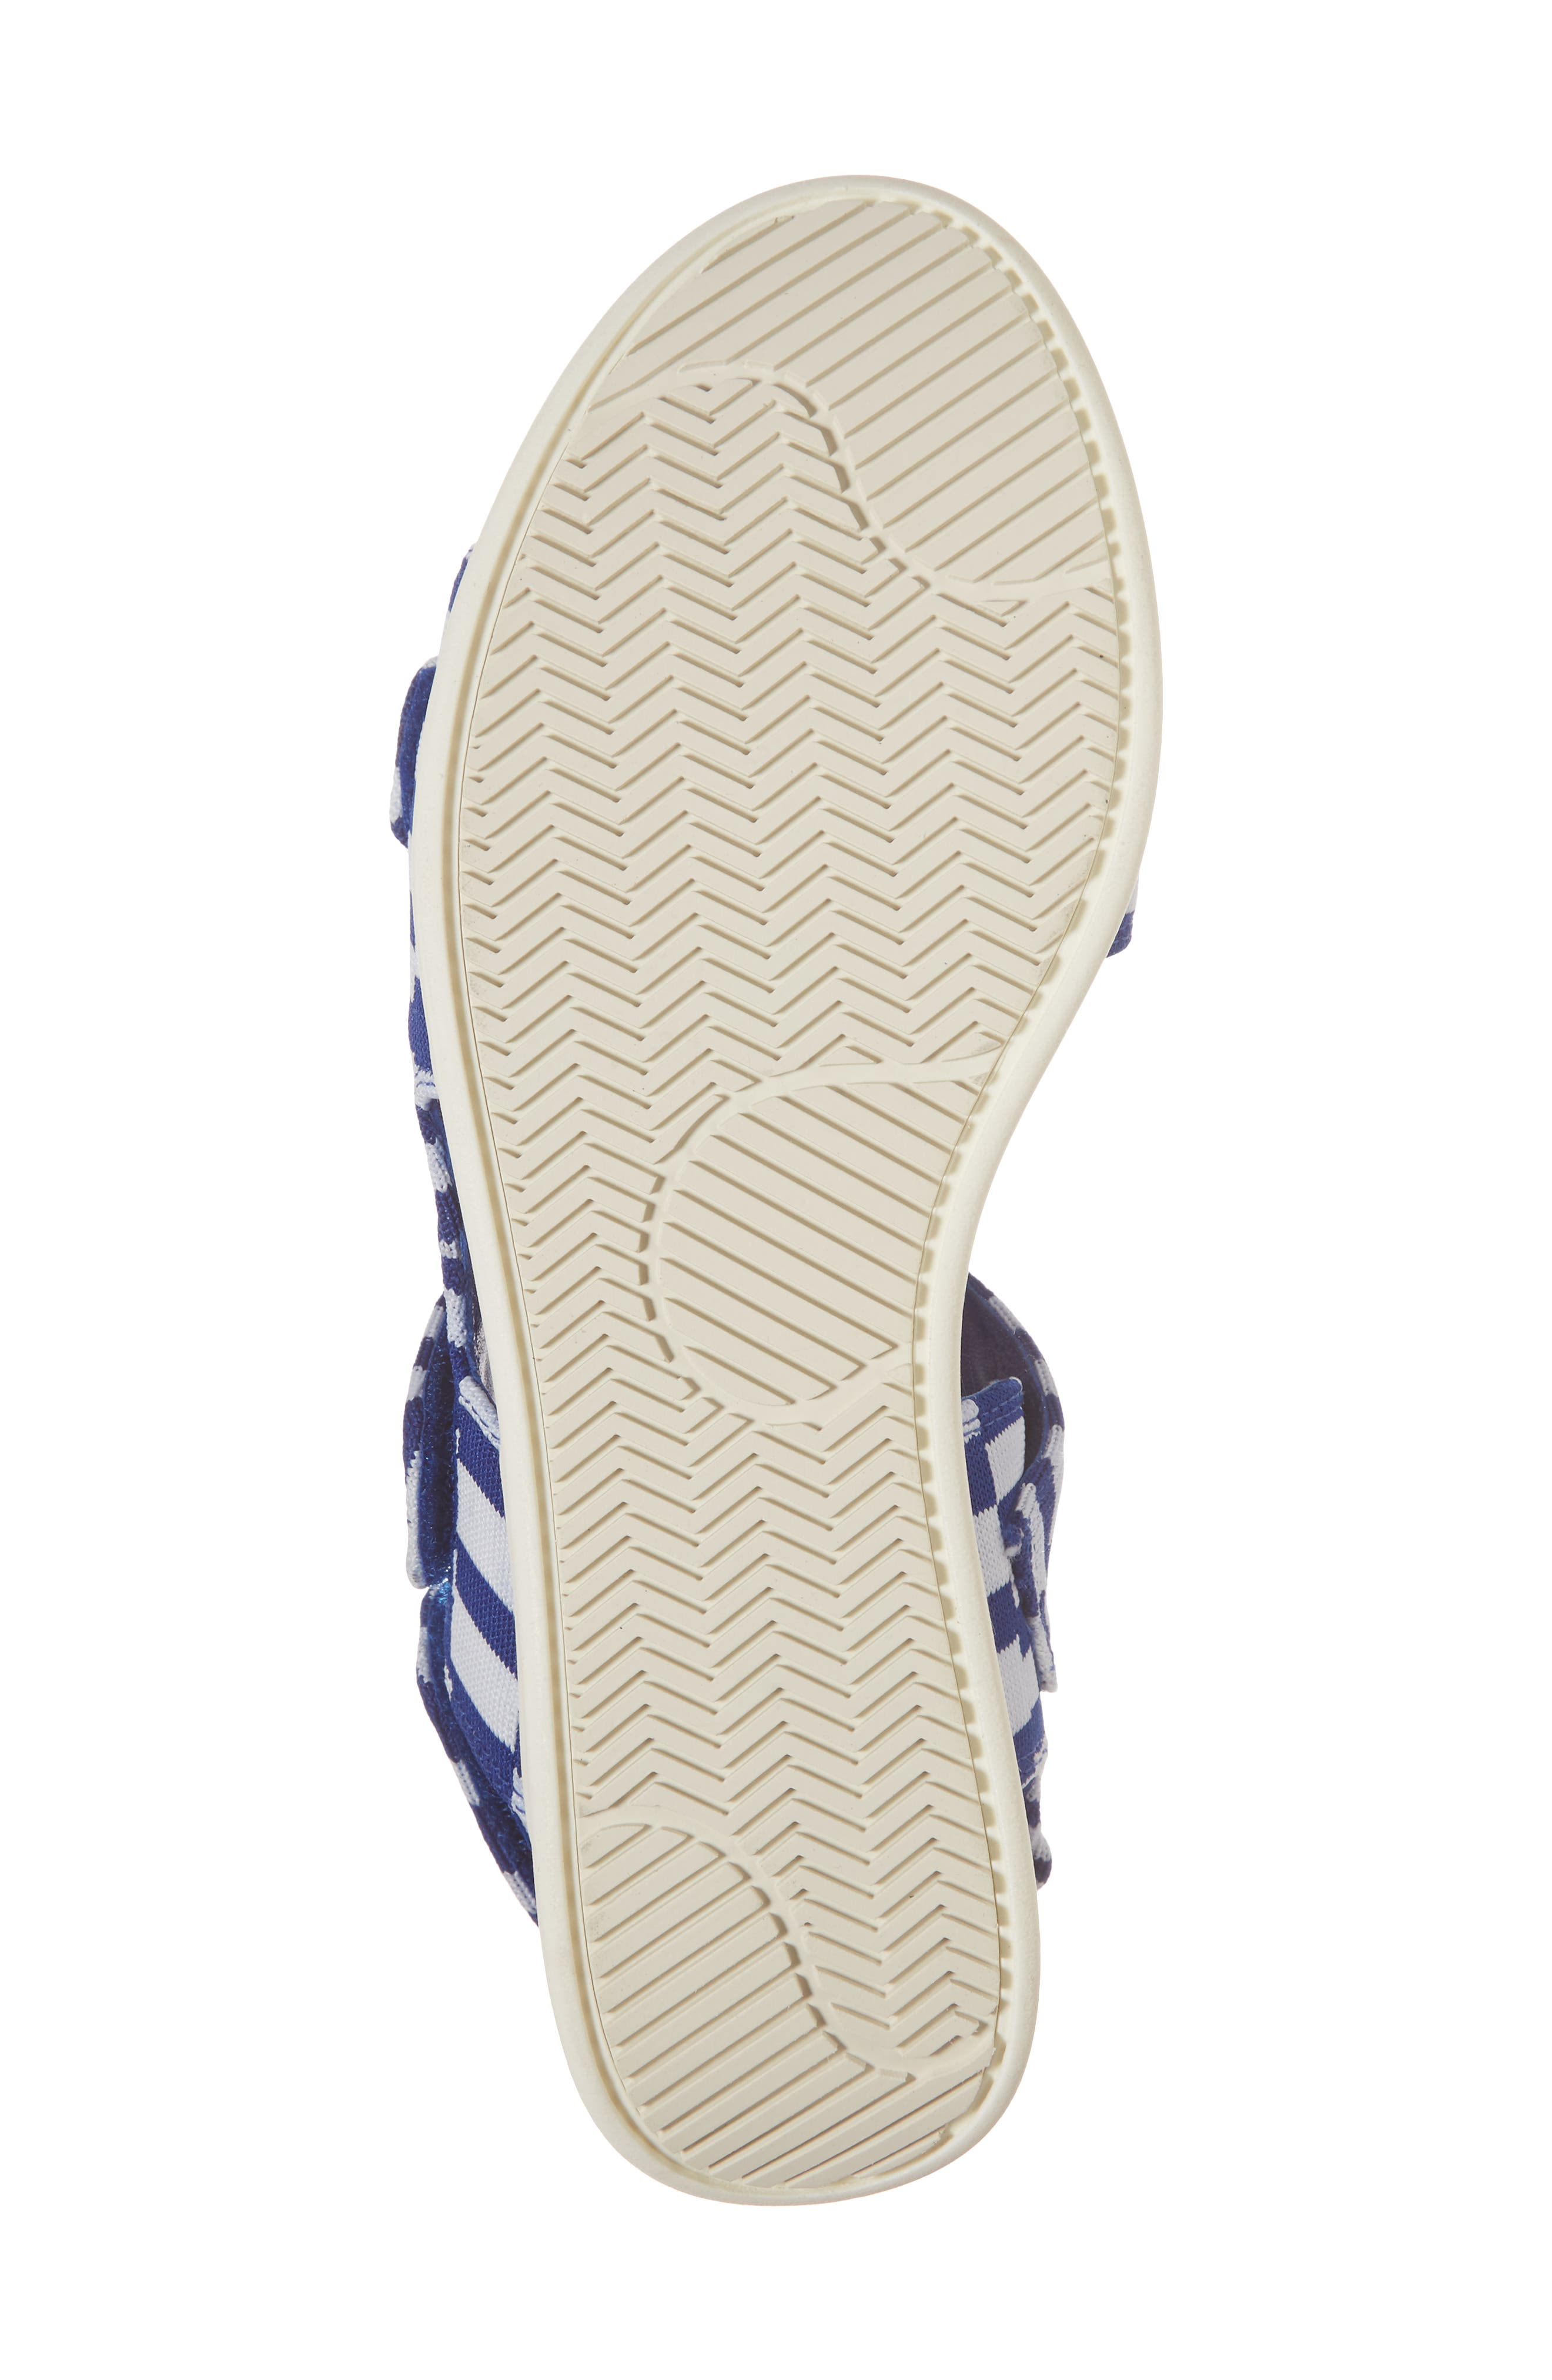 Flatform Sandal,                             Alternate thumbnail 6, color,                             Check Slalom Blue